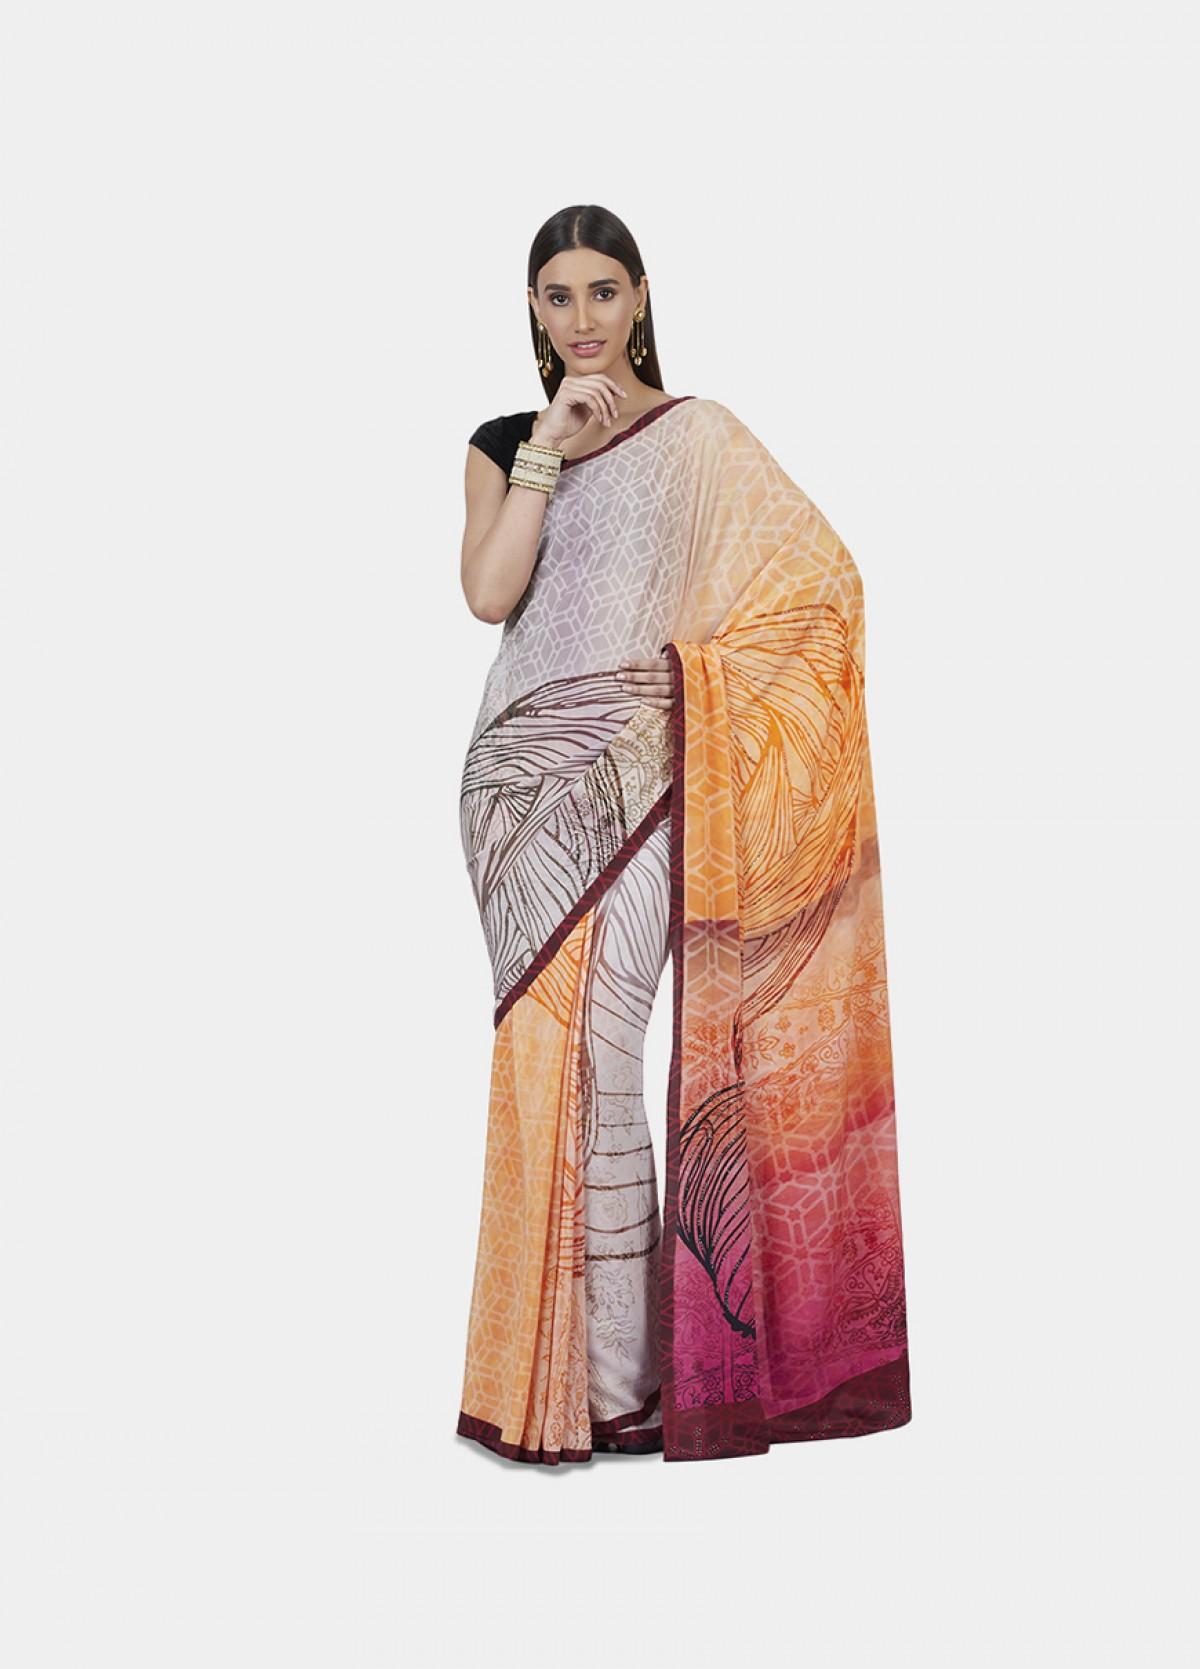 The Garlic Sari